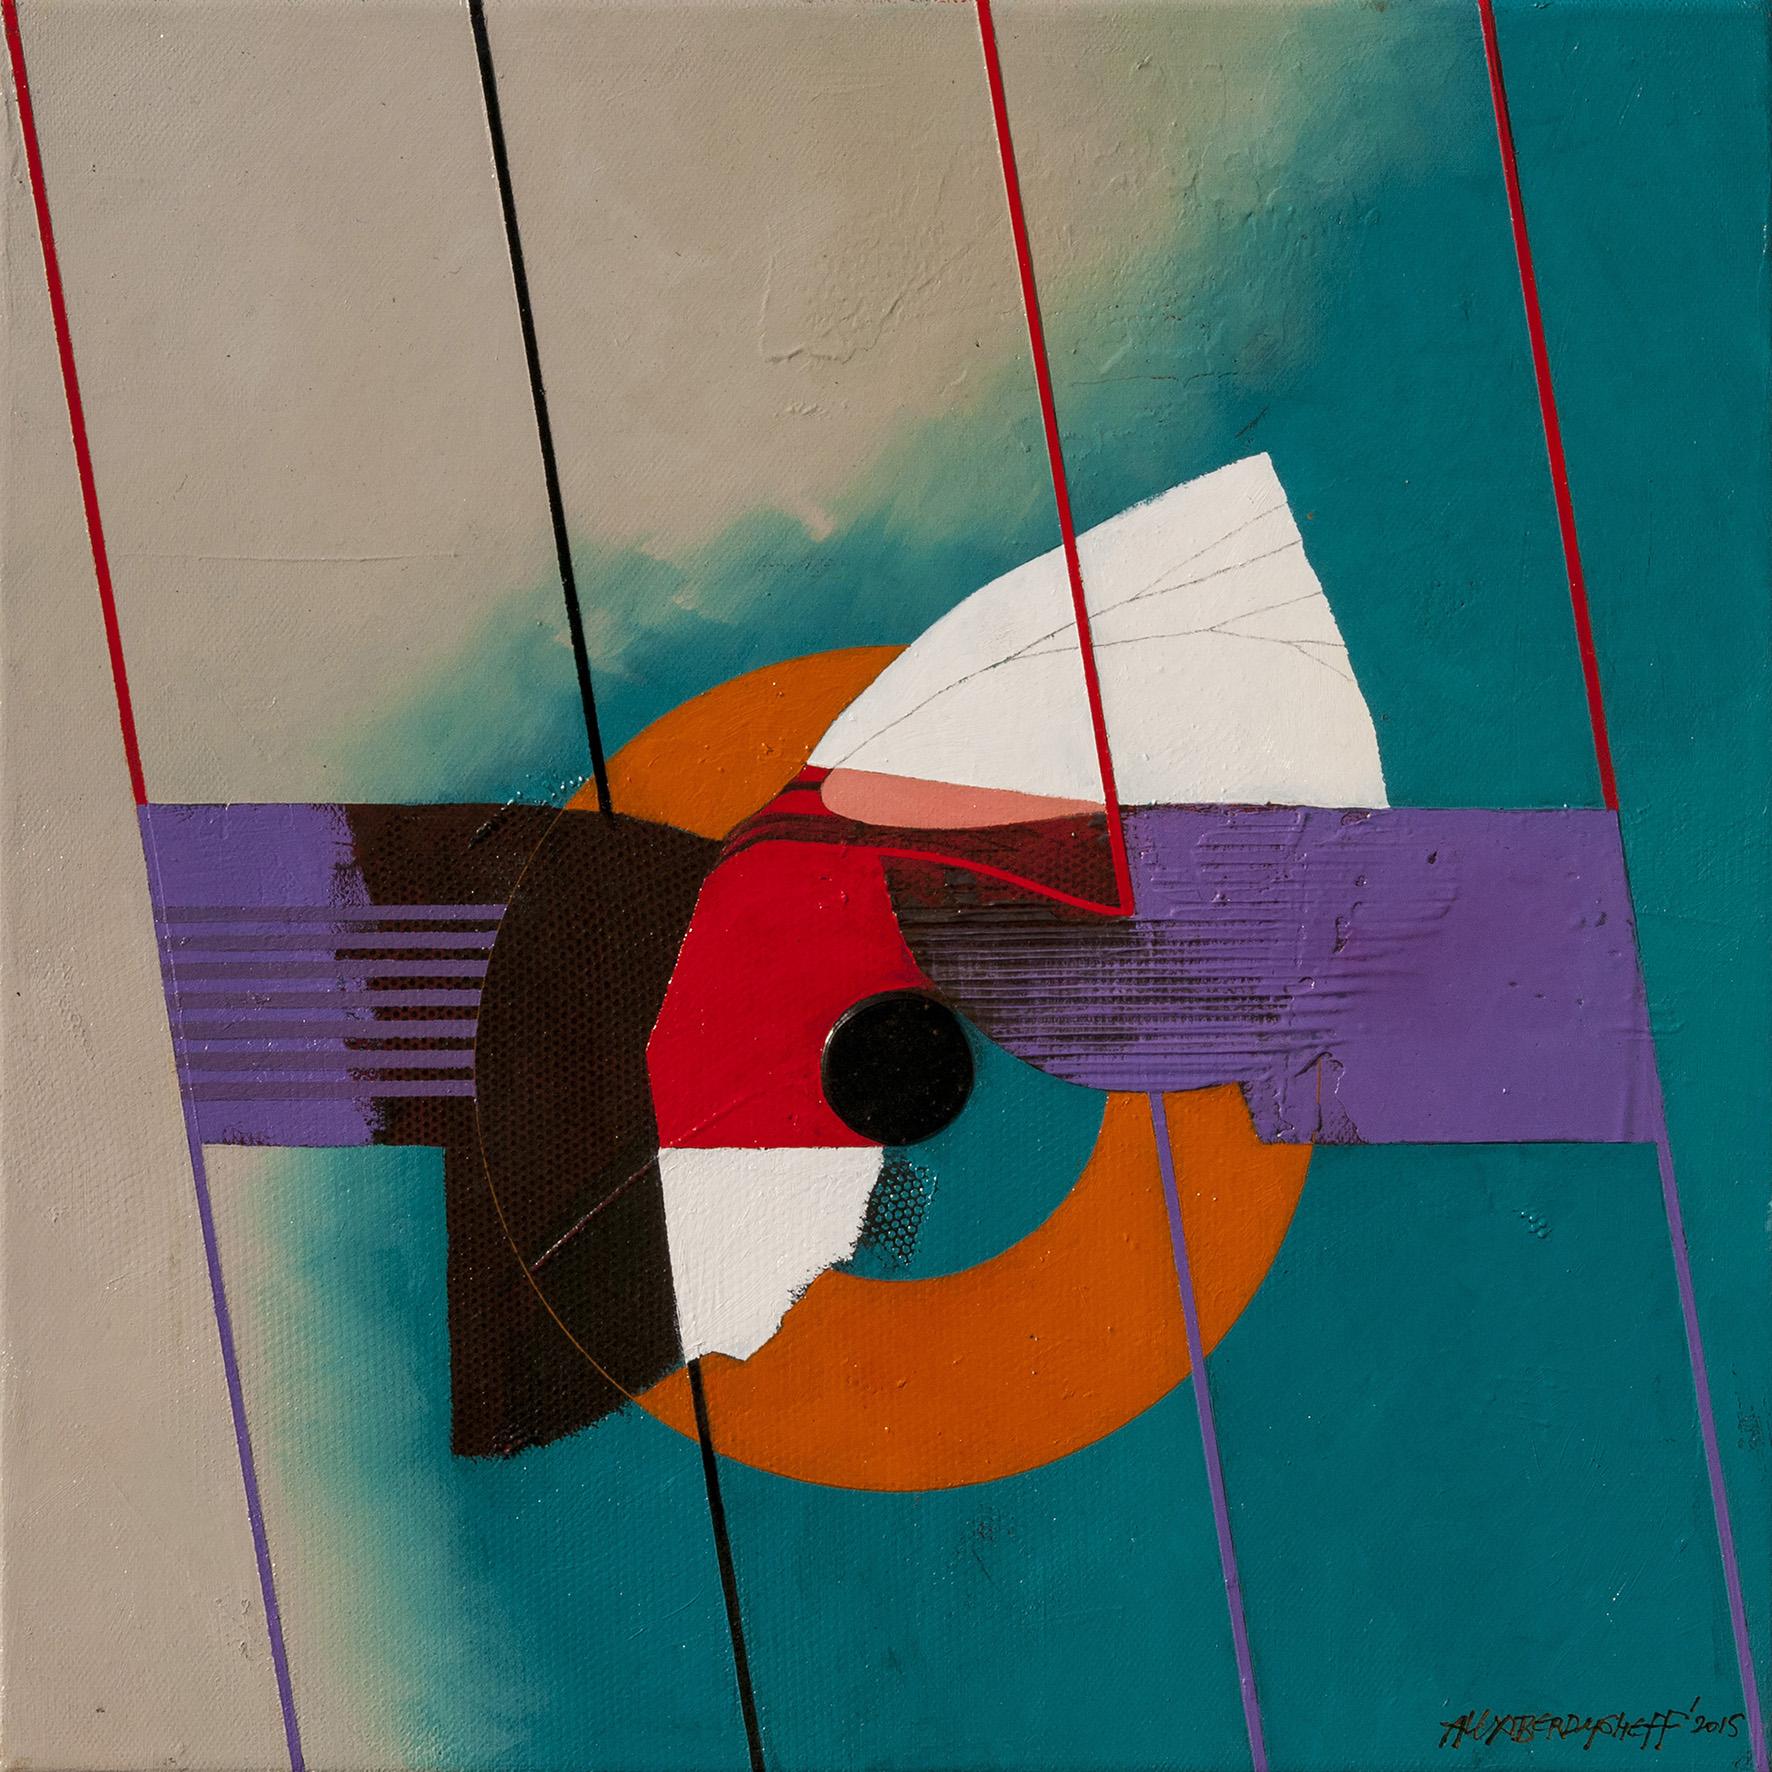 Rhythm VI, oil on canvas, 46x46 cm, 2015